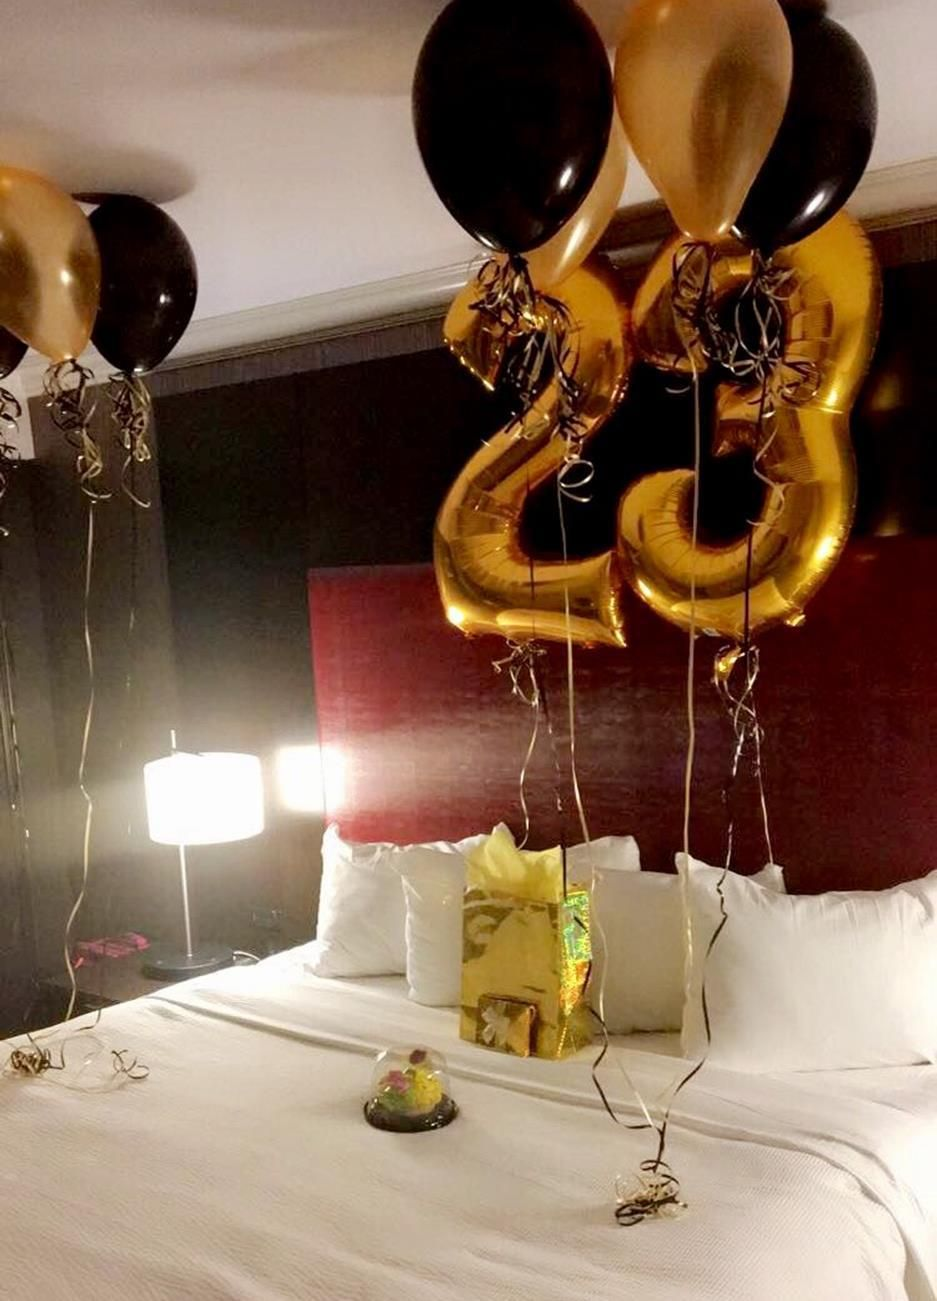 Romantic Hotel Room Ideas: 31 Stunning Decorating Ideas Birthday Surprise